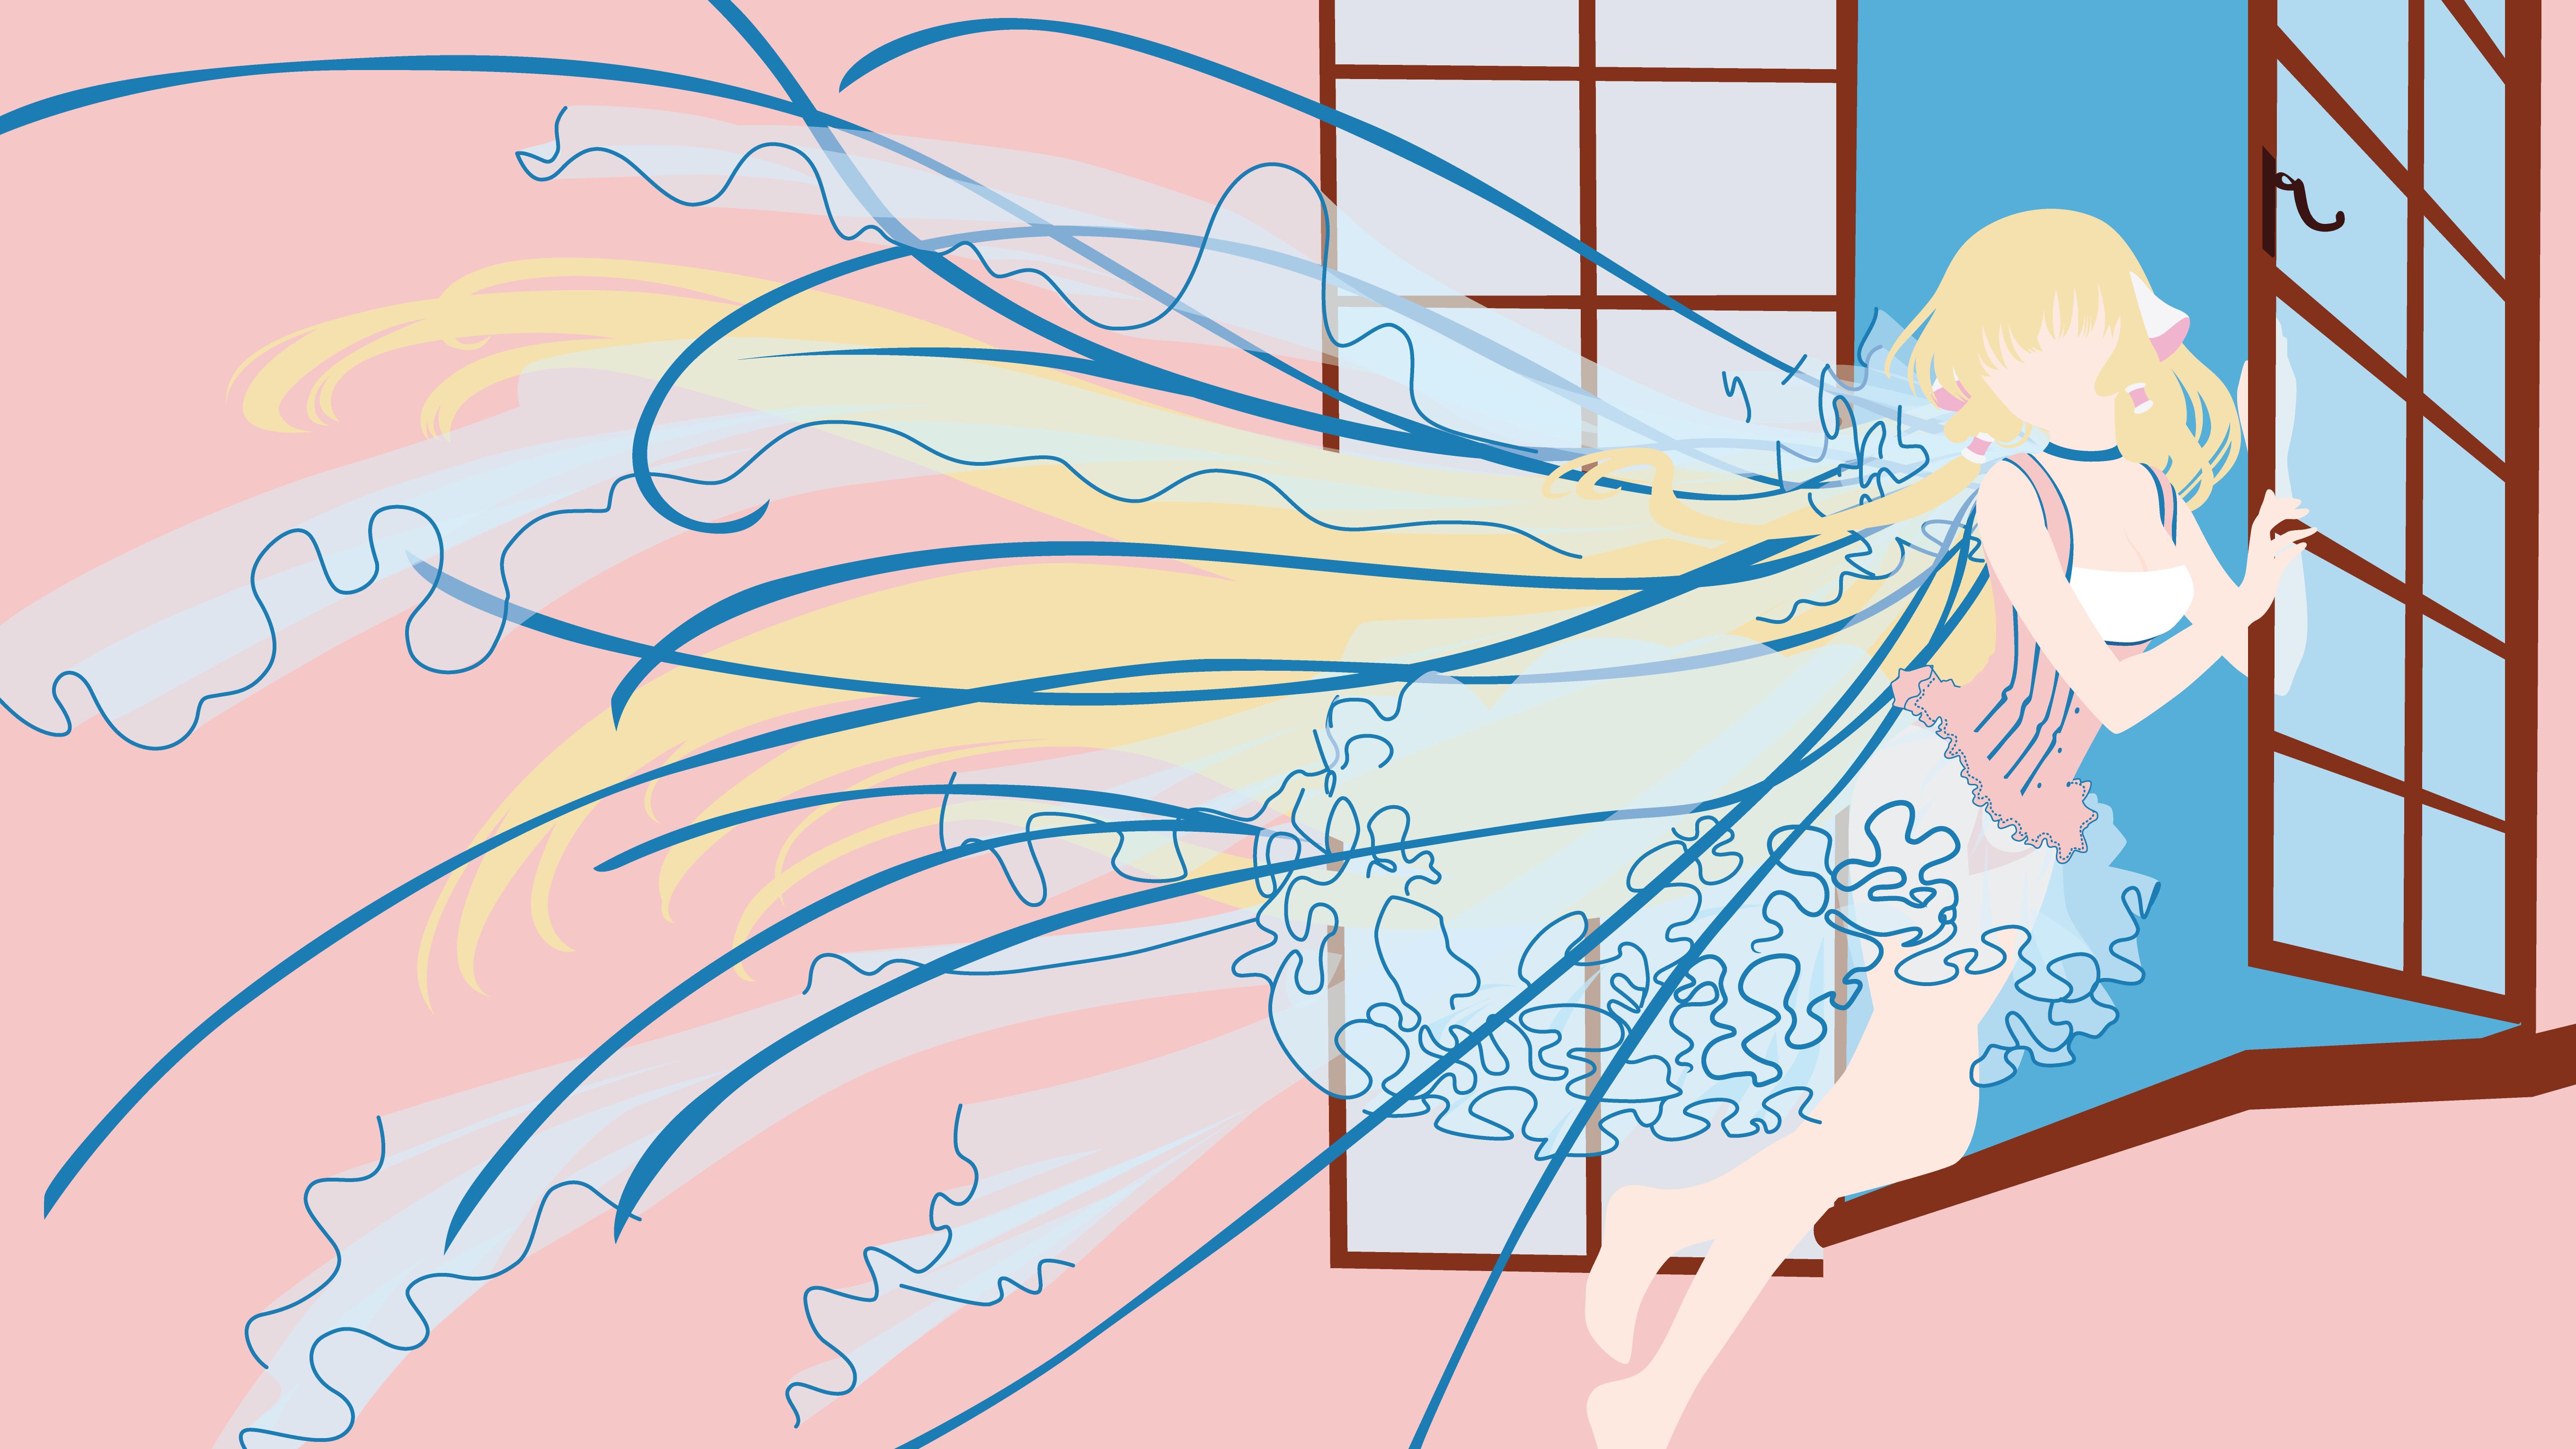 Anime 5443x3061 Chobits manga anime girls long hair blonde pink background window